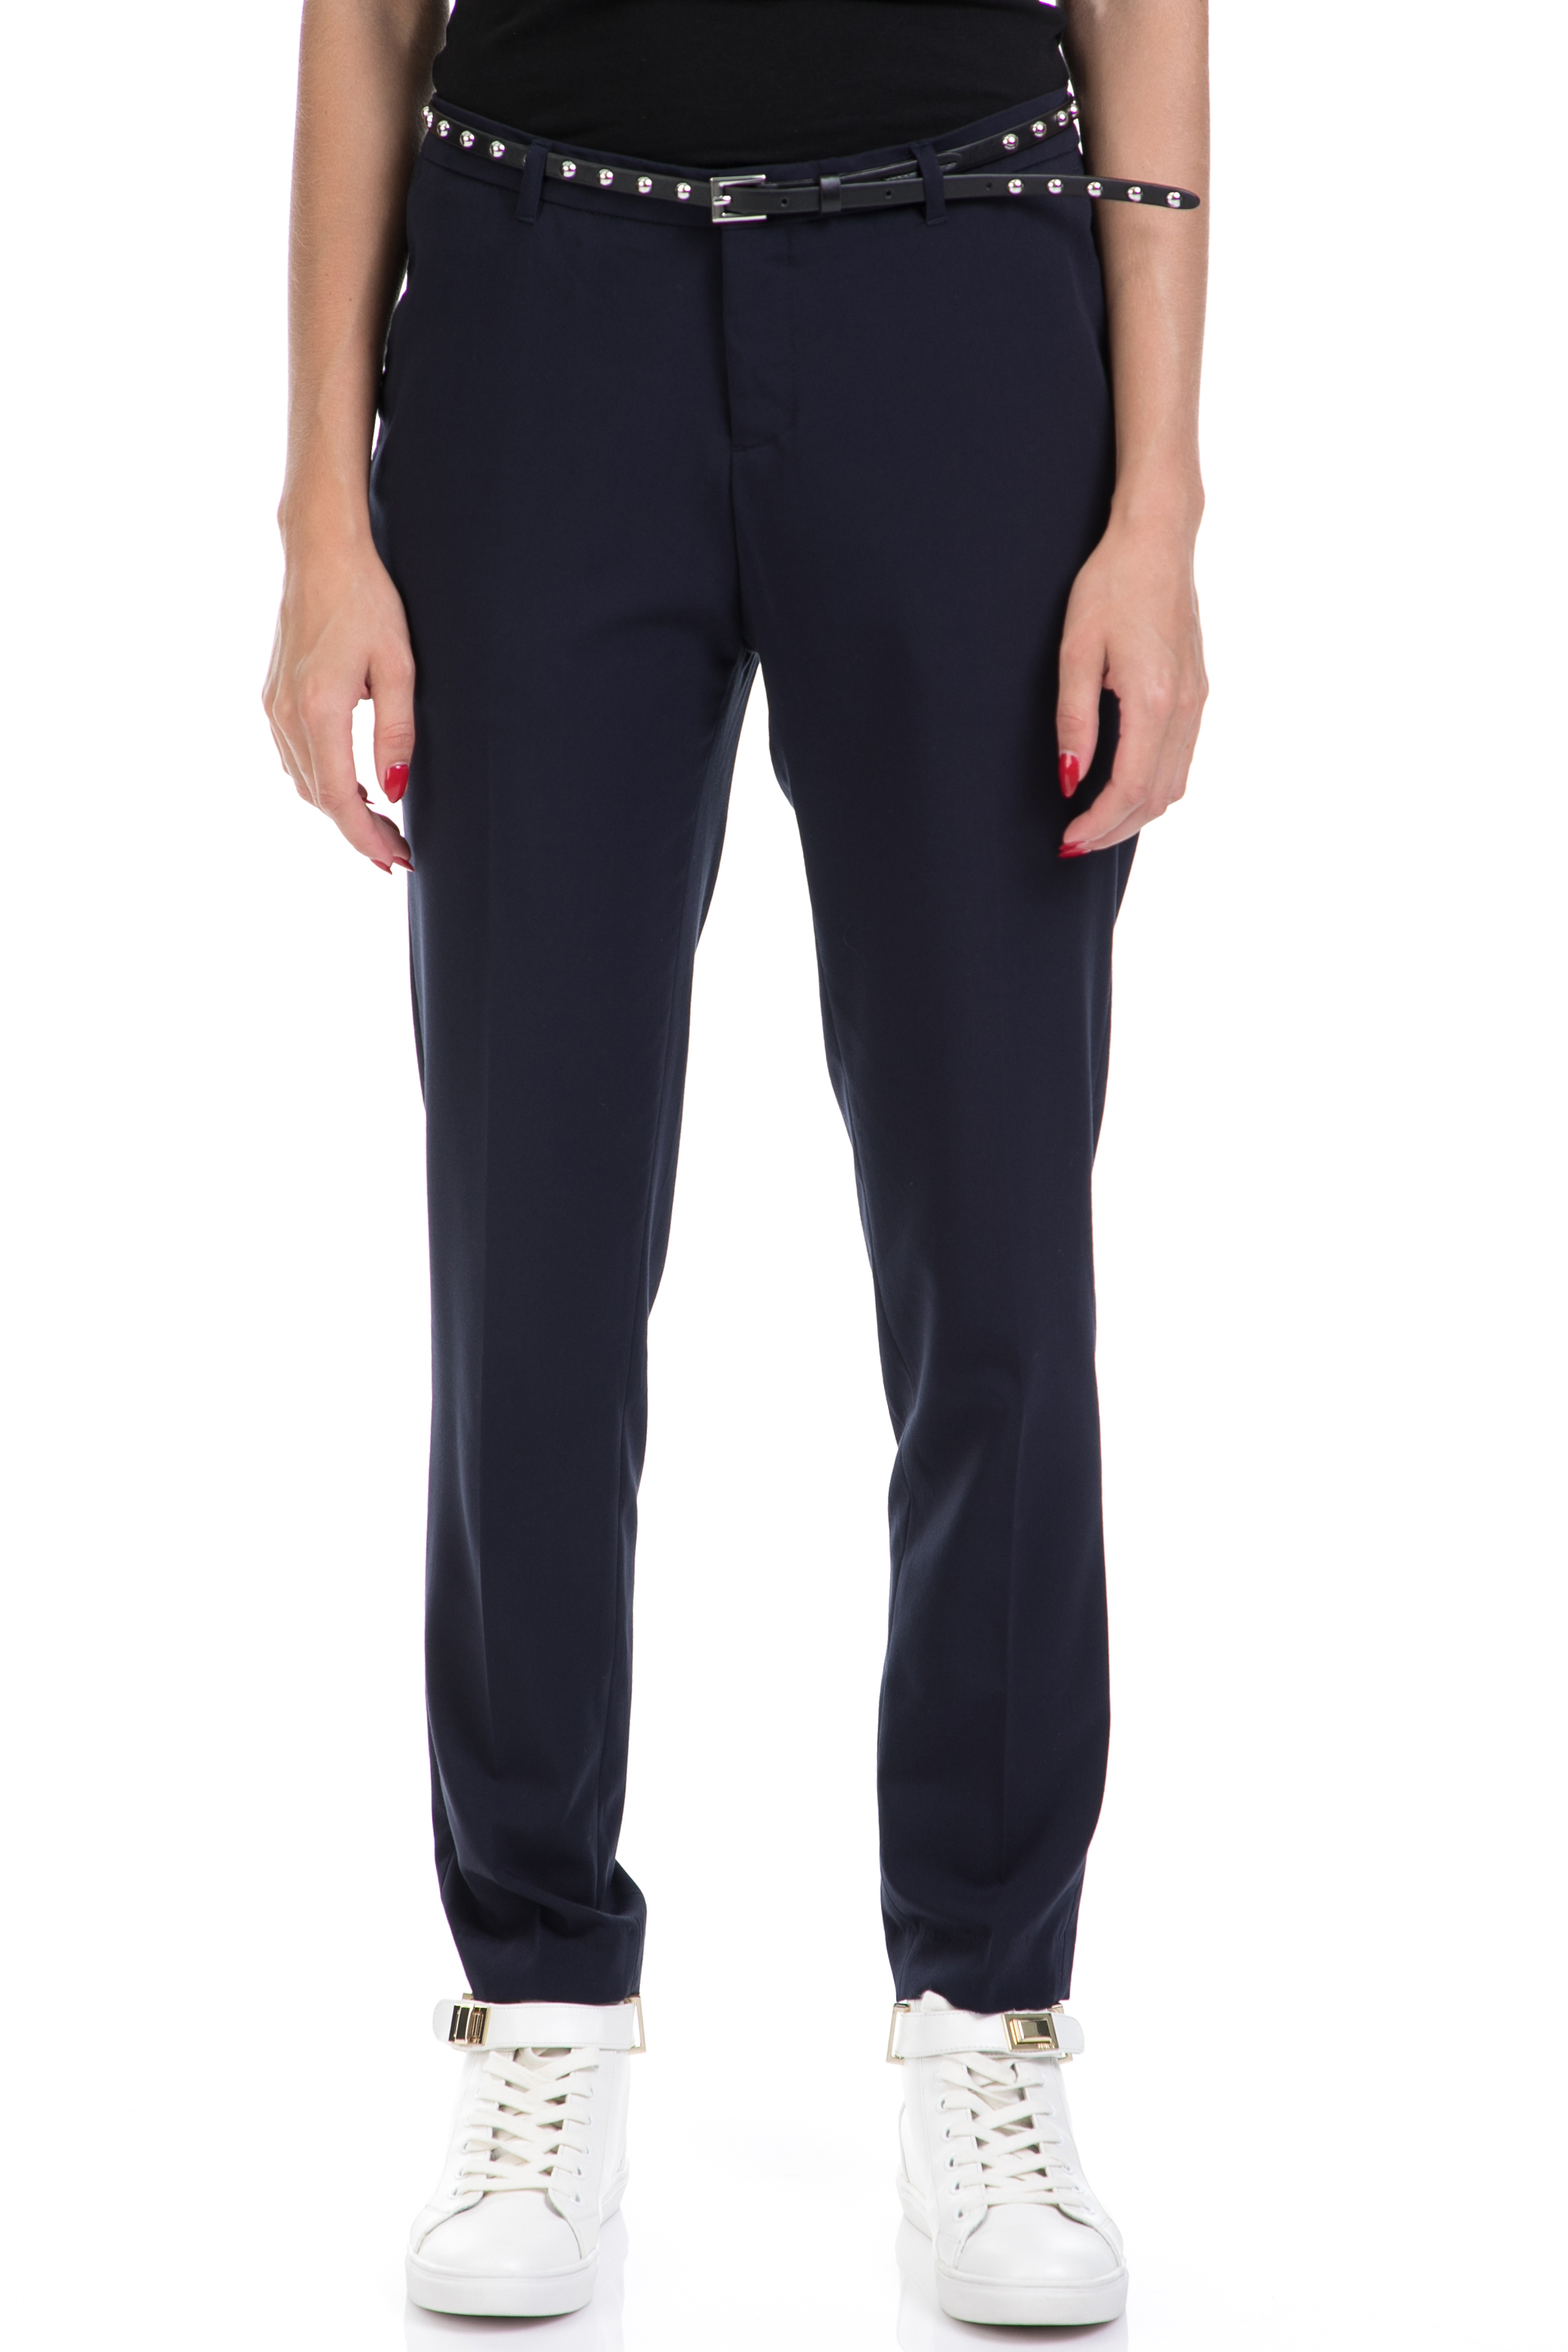 SCOTCH   SODA – Γυναικείο παντελόνι MAISON SCOTCH μπλε bc9eec71264